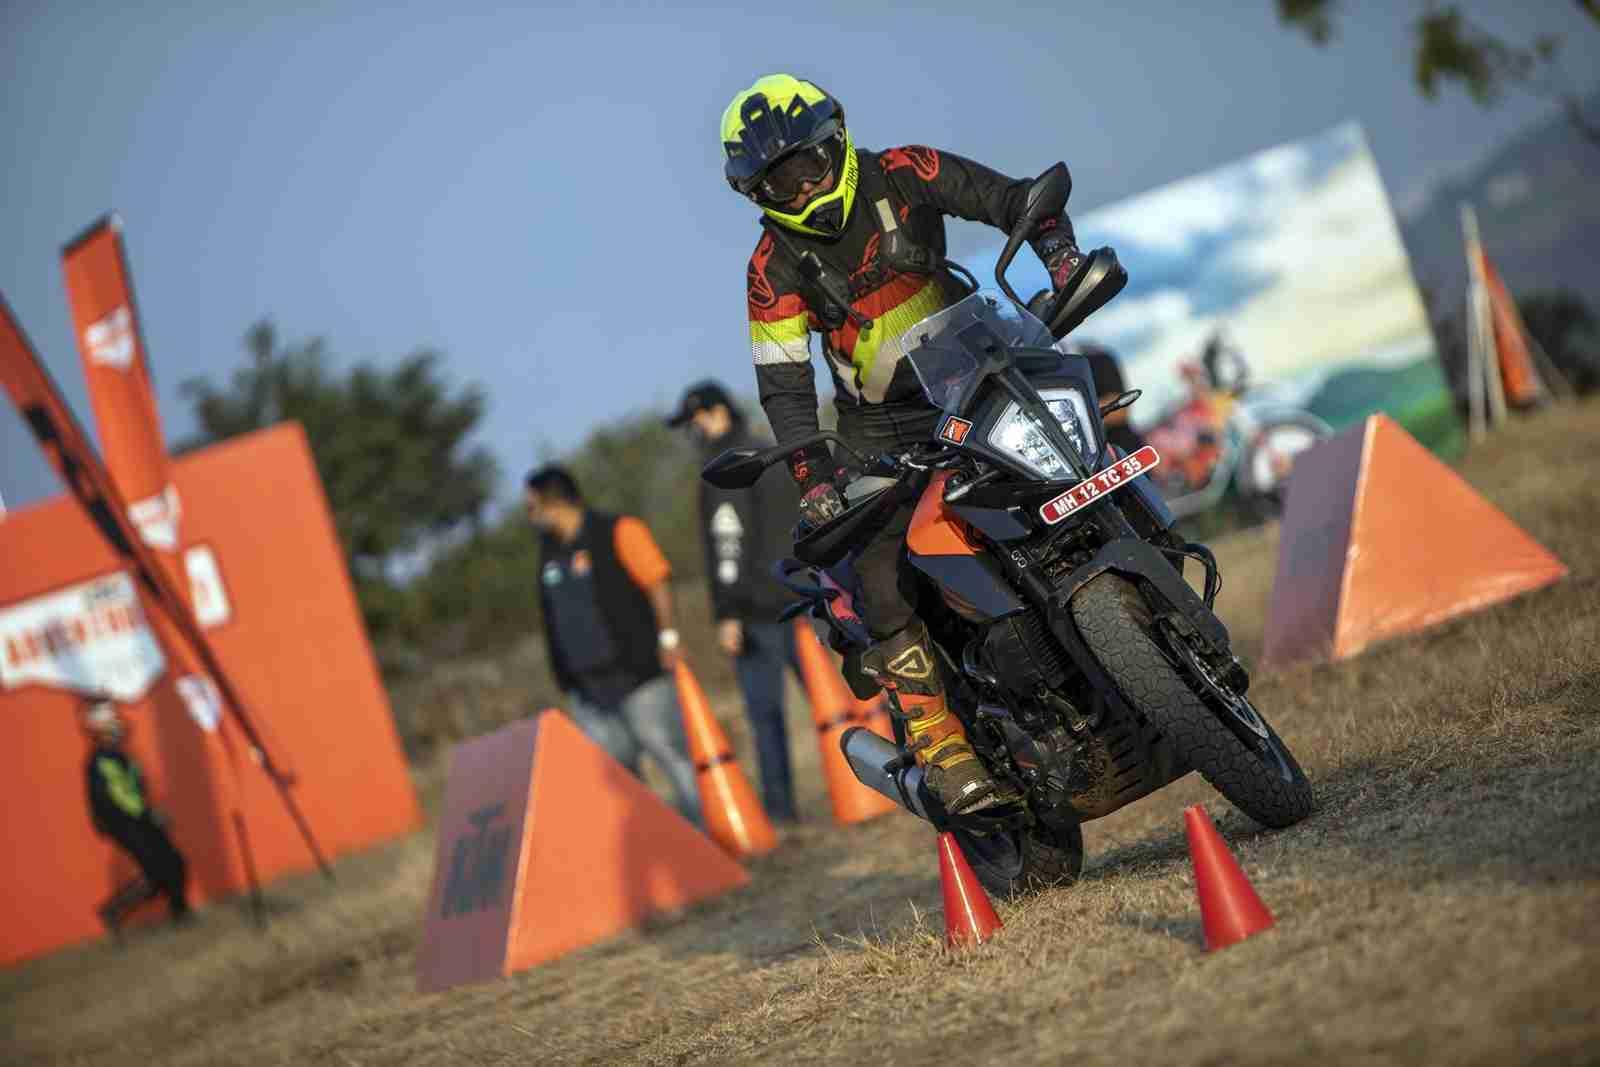 India KTM Adventure Day in Pune